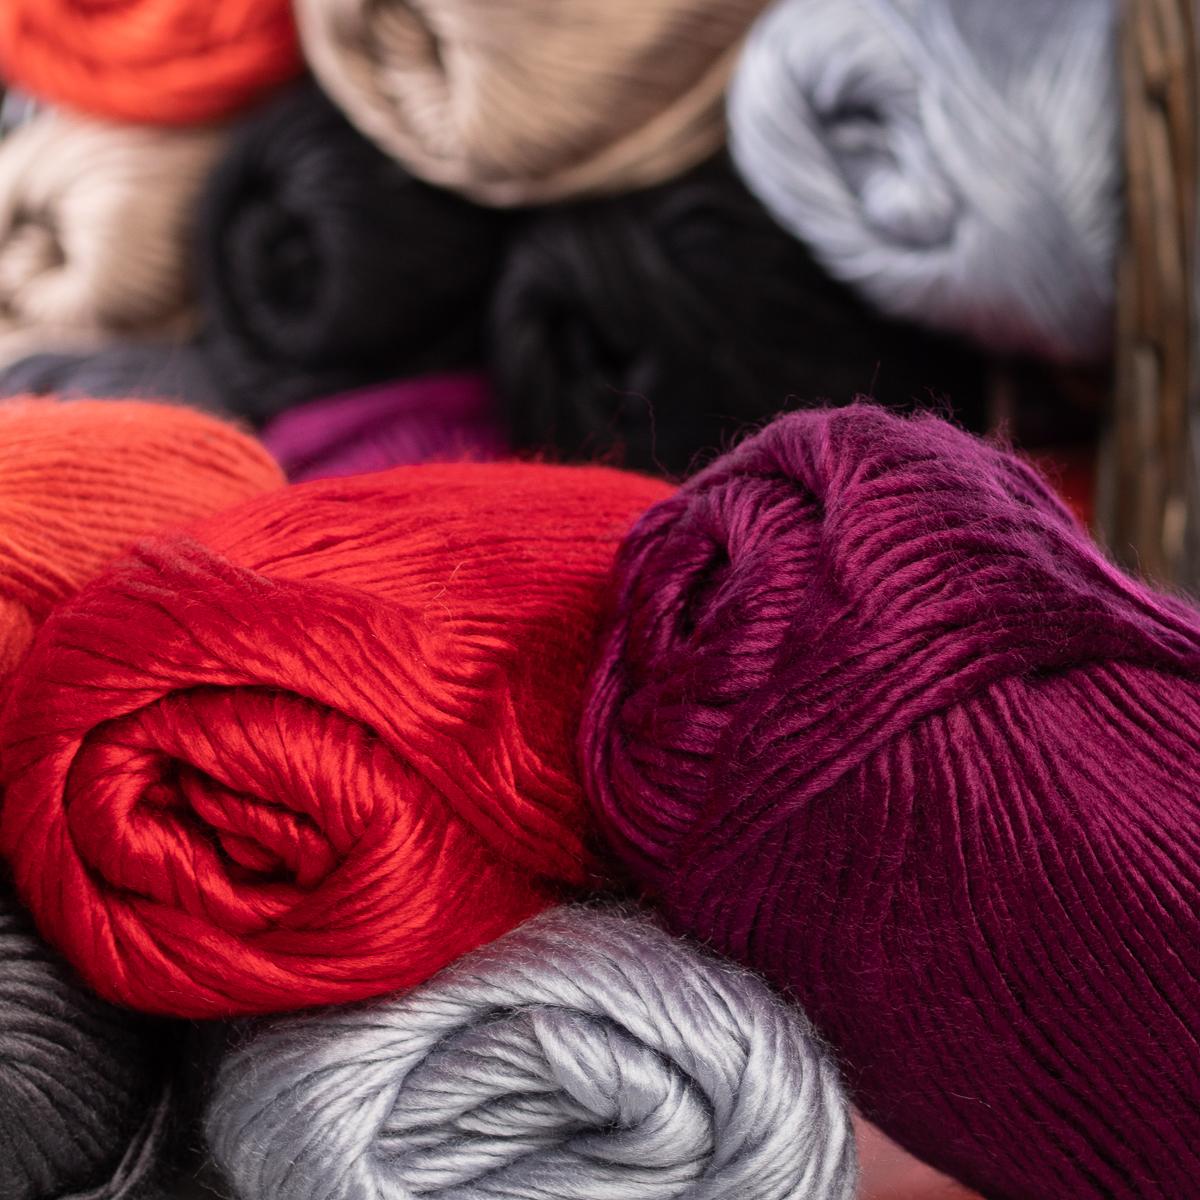 3pk-Lion-Brand-Yarn-Landscapes-Acrylic-100-Medium-4-Soft-Knitting-Crocheting thumbnail 14